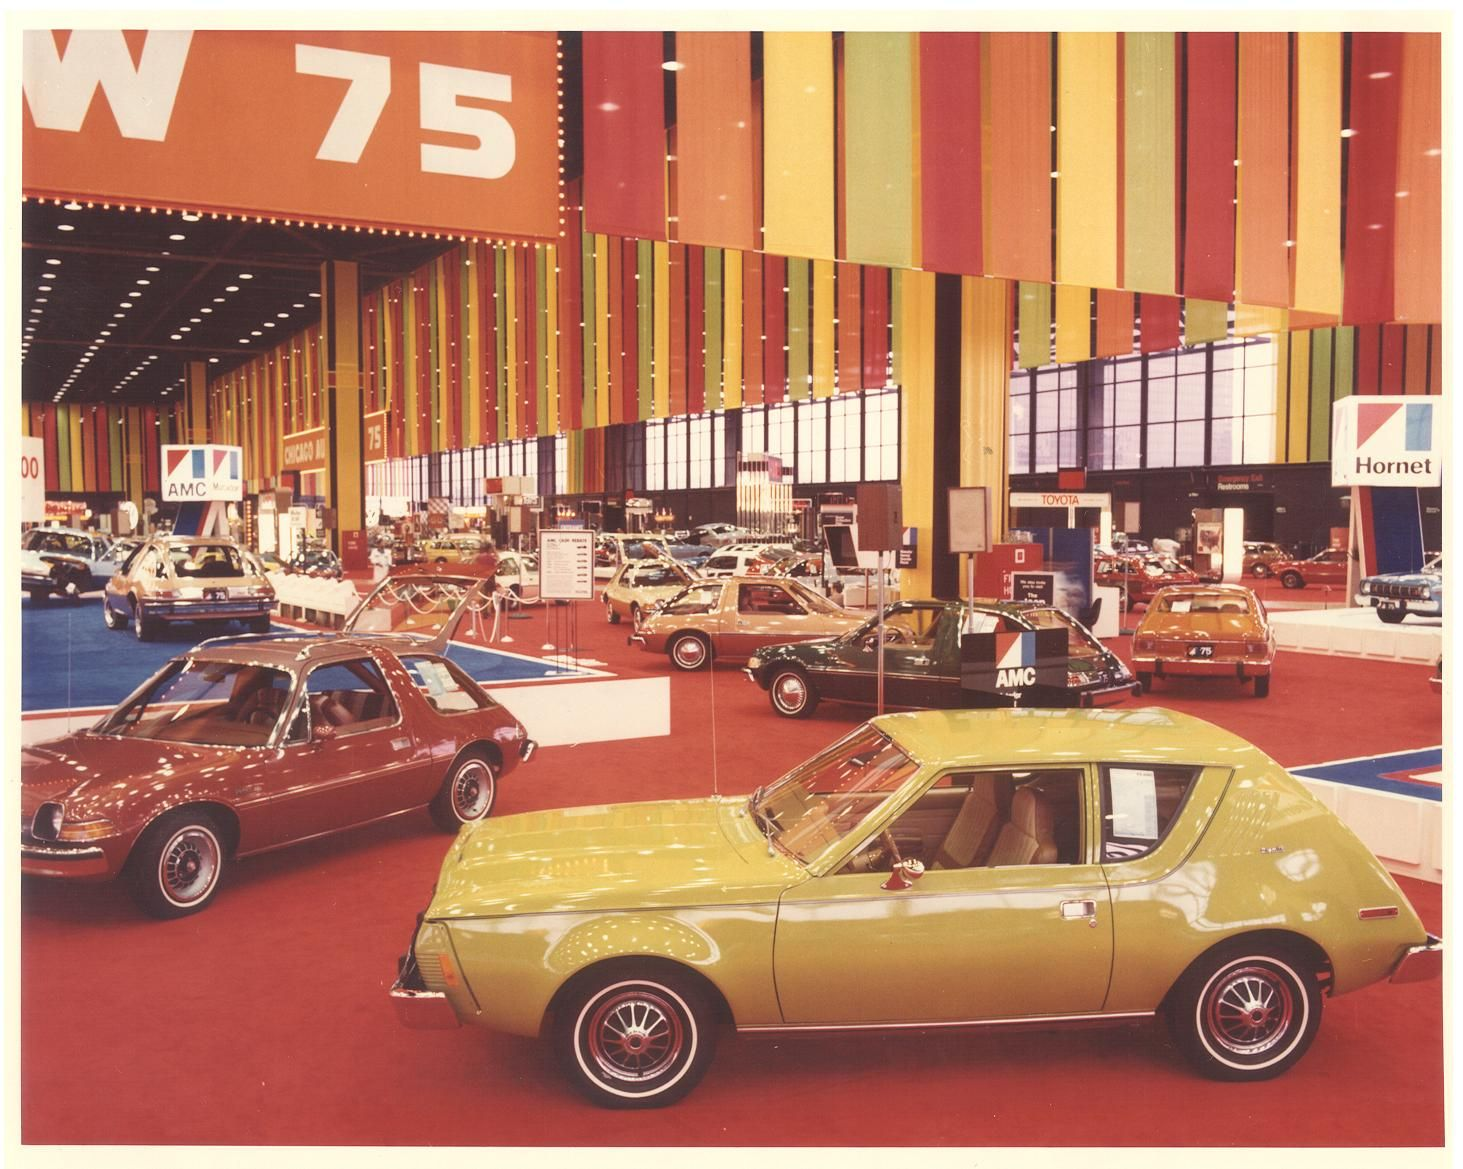 1975 Chicago Auto Show American Motors AMC. I love AMC's